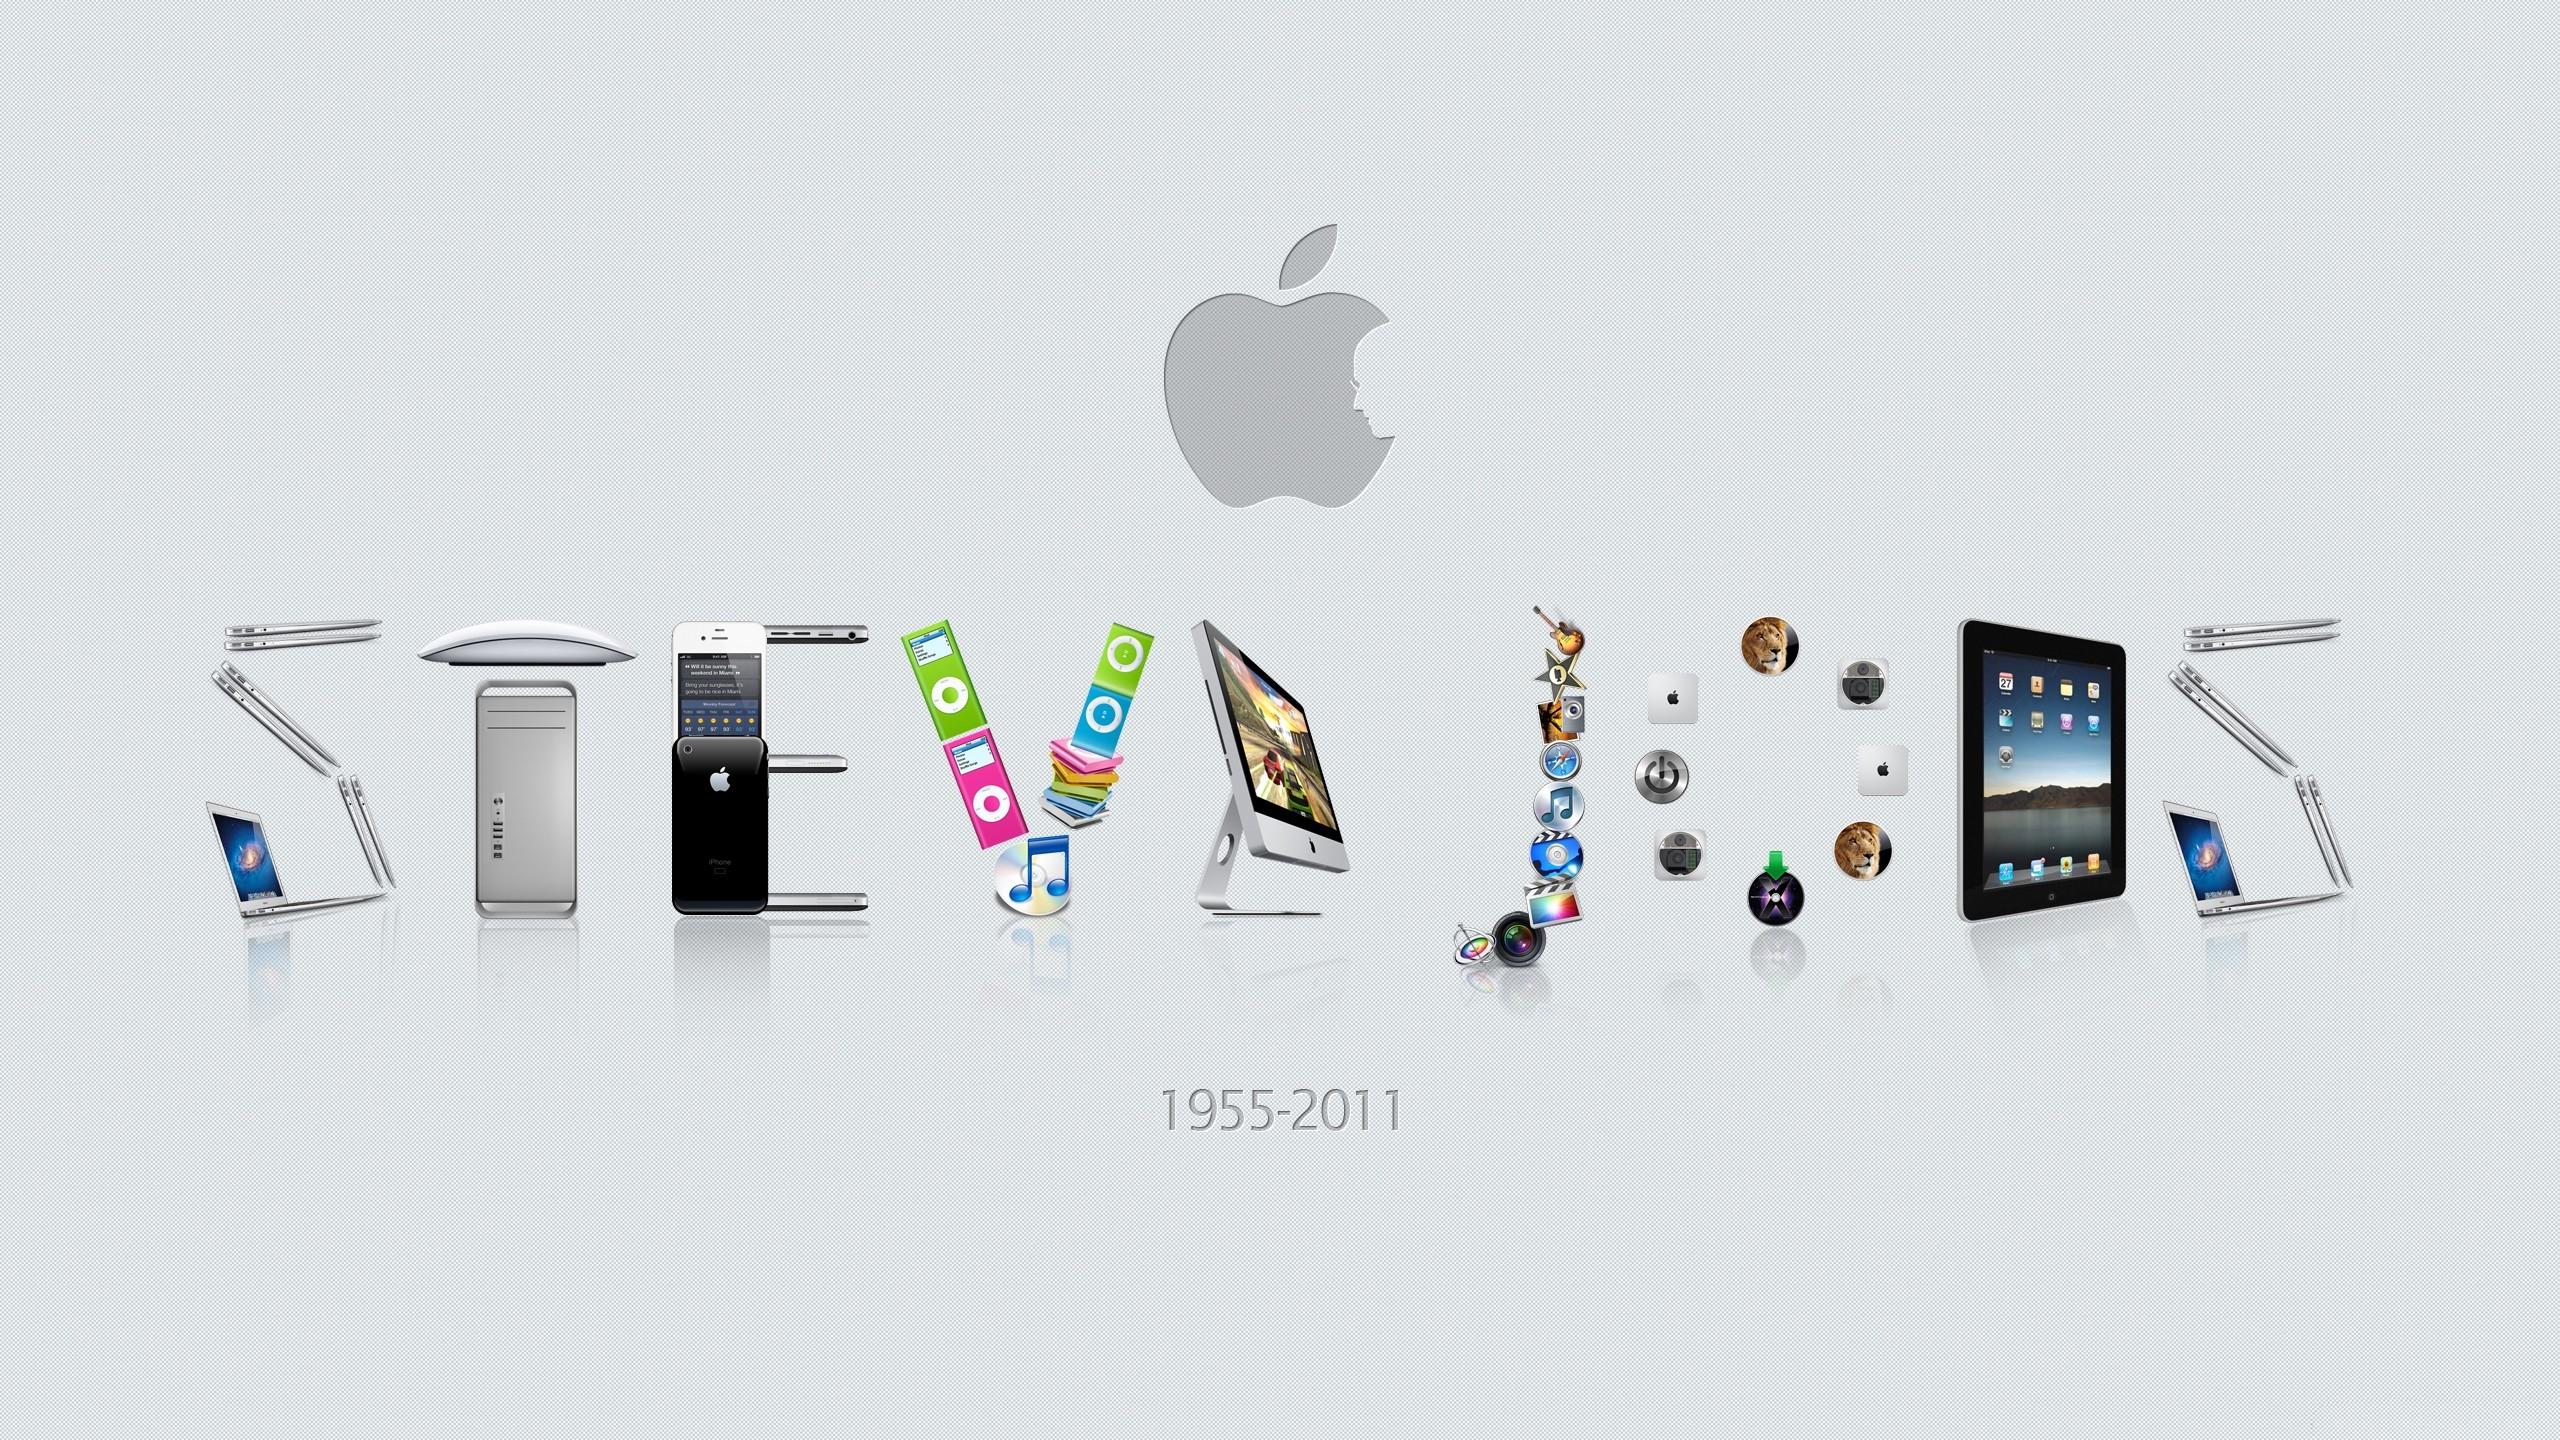 Steve Jobs Apple Background - HD Wallpaper